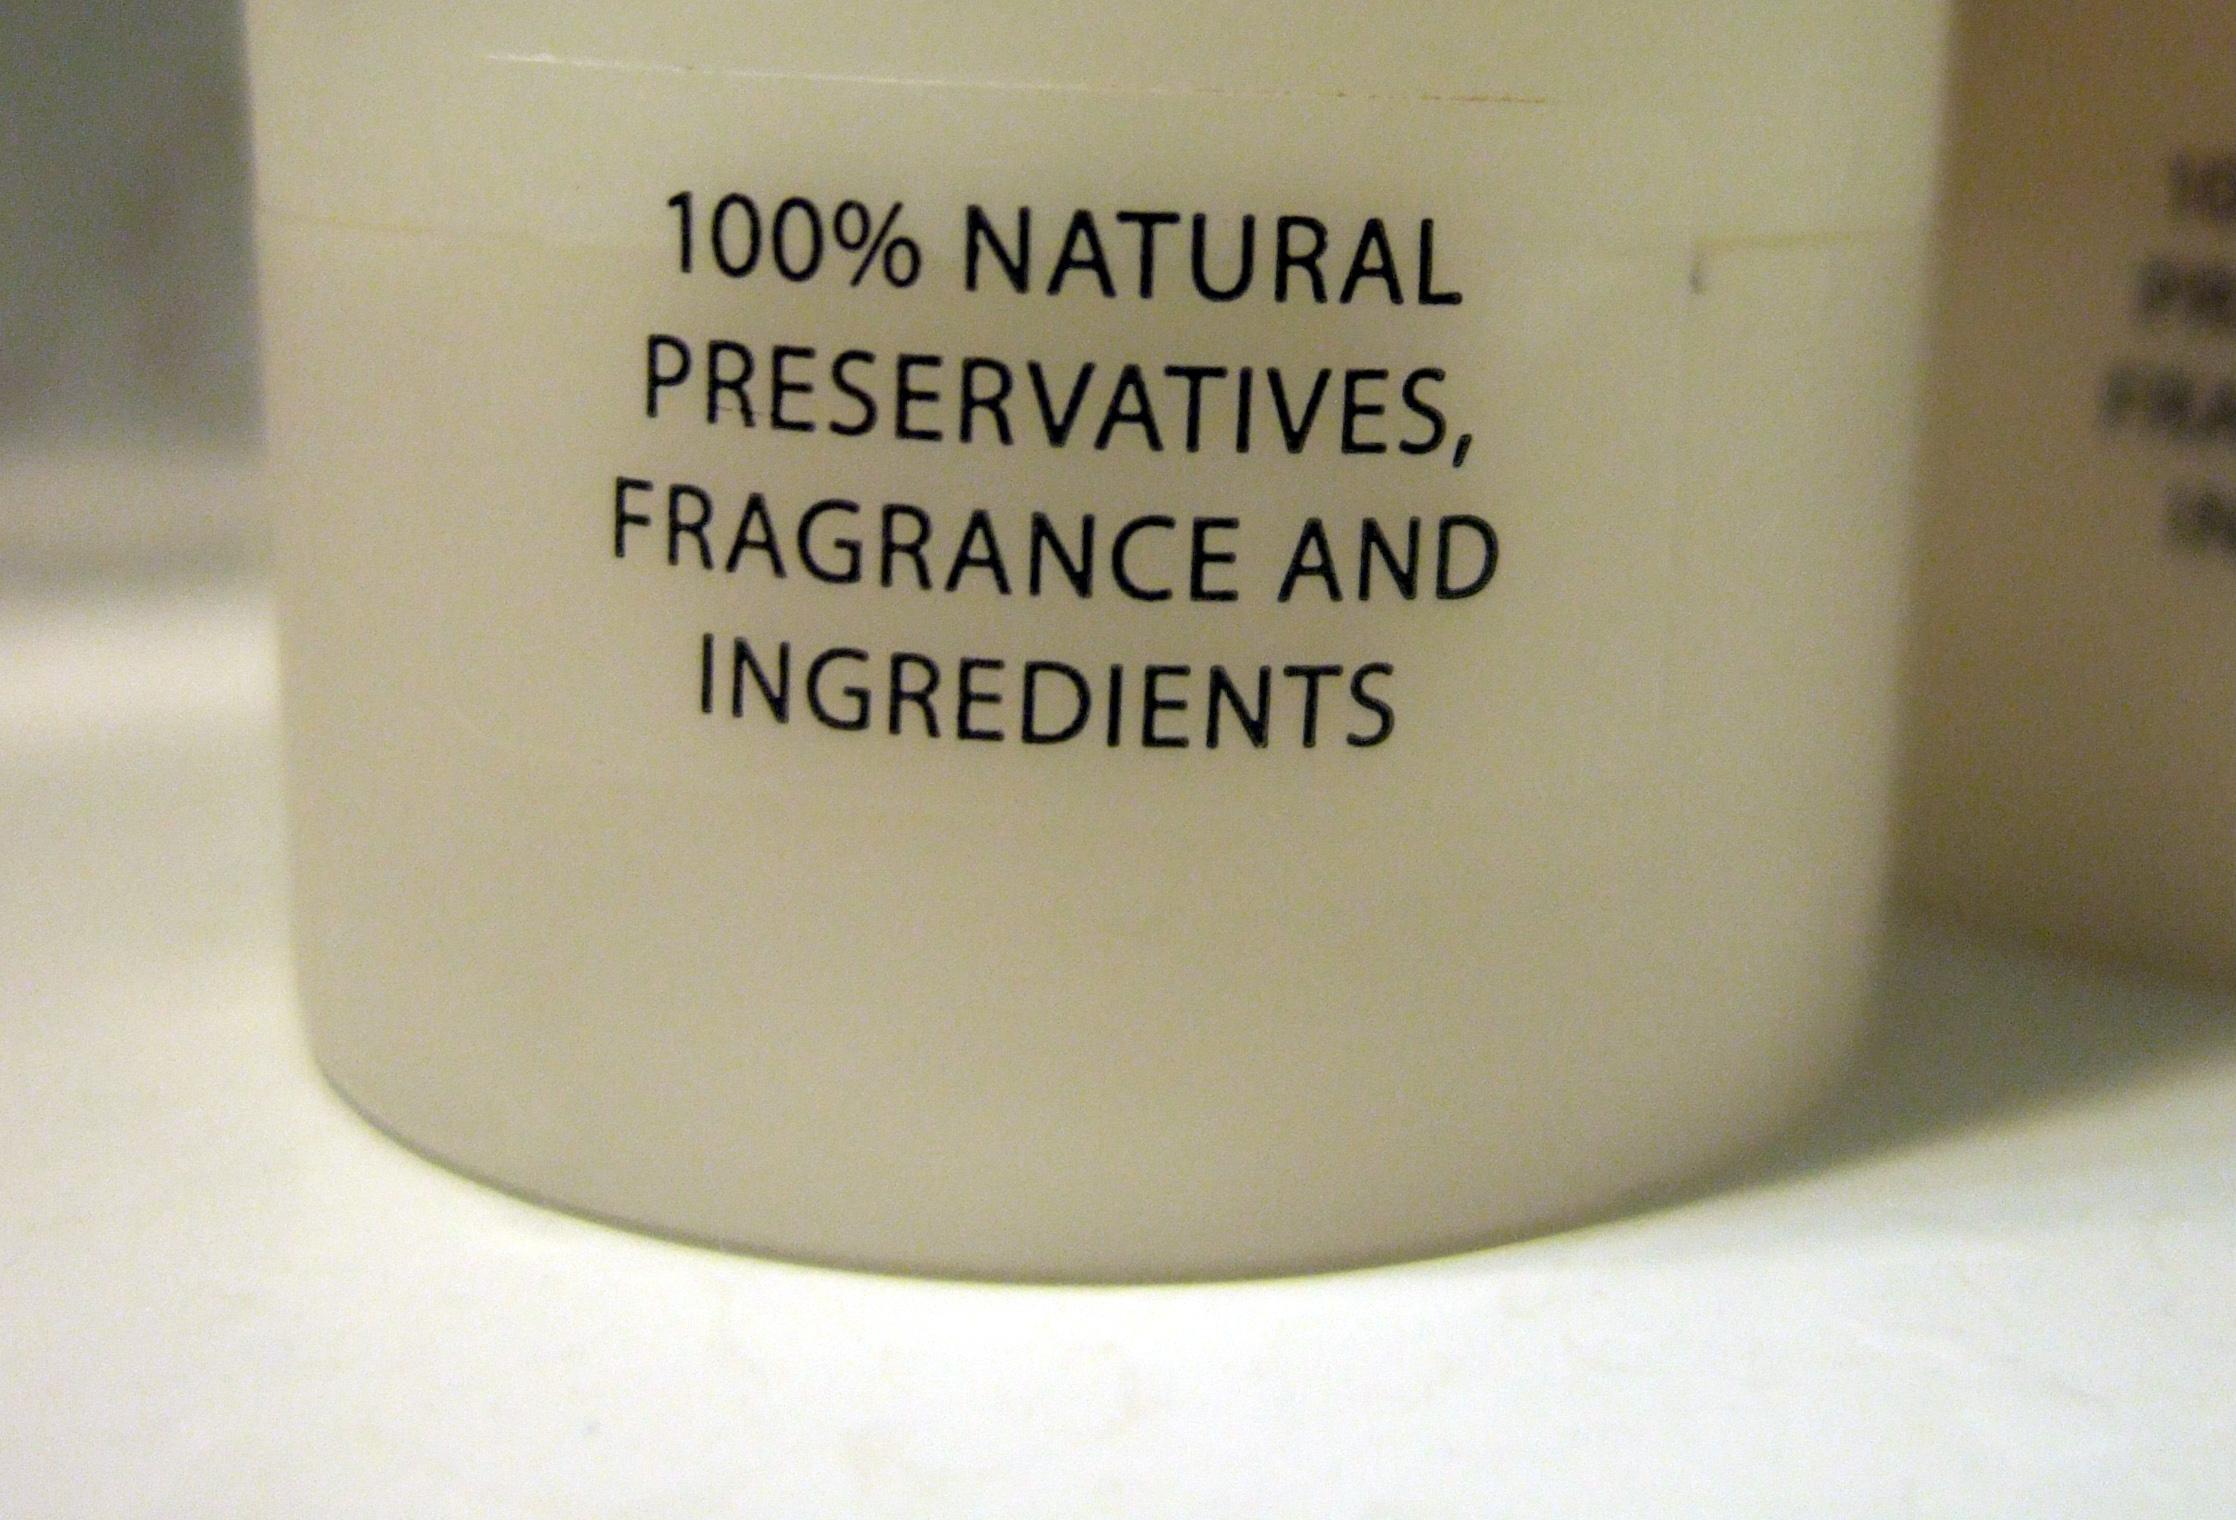 Lovea Nature Shampoo Review